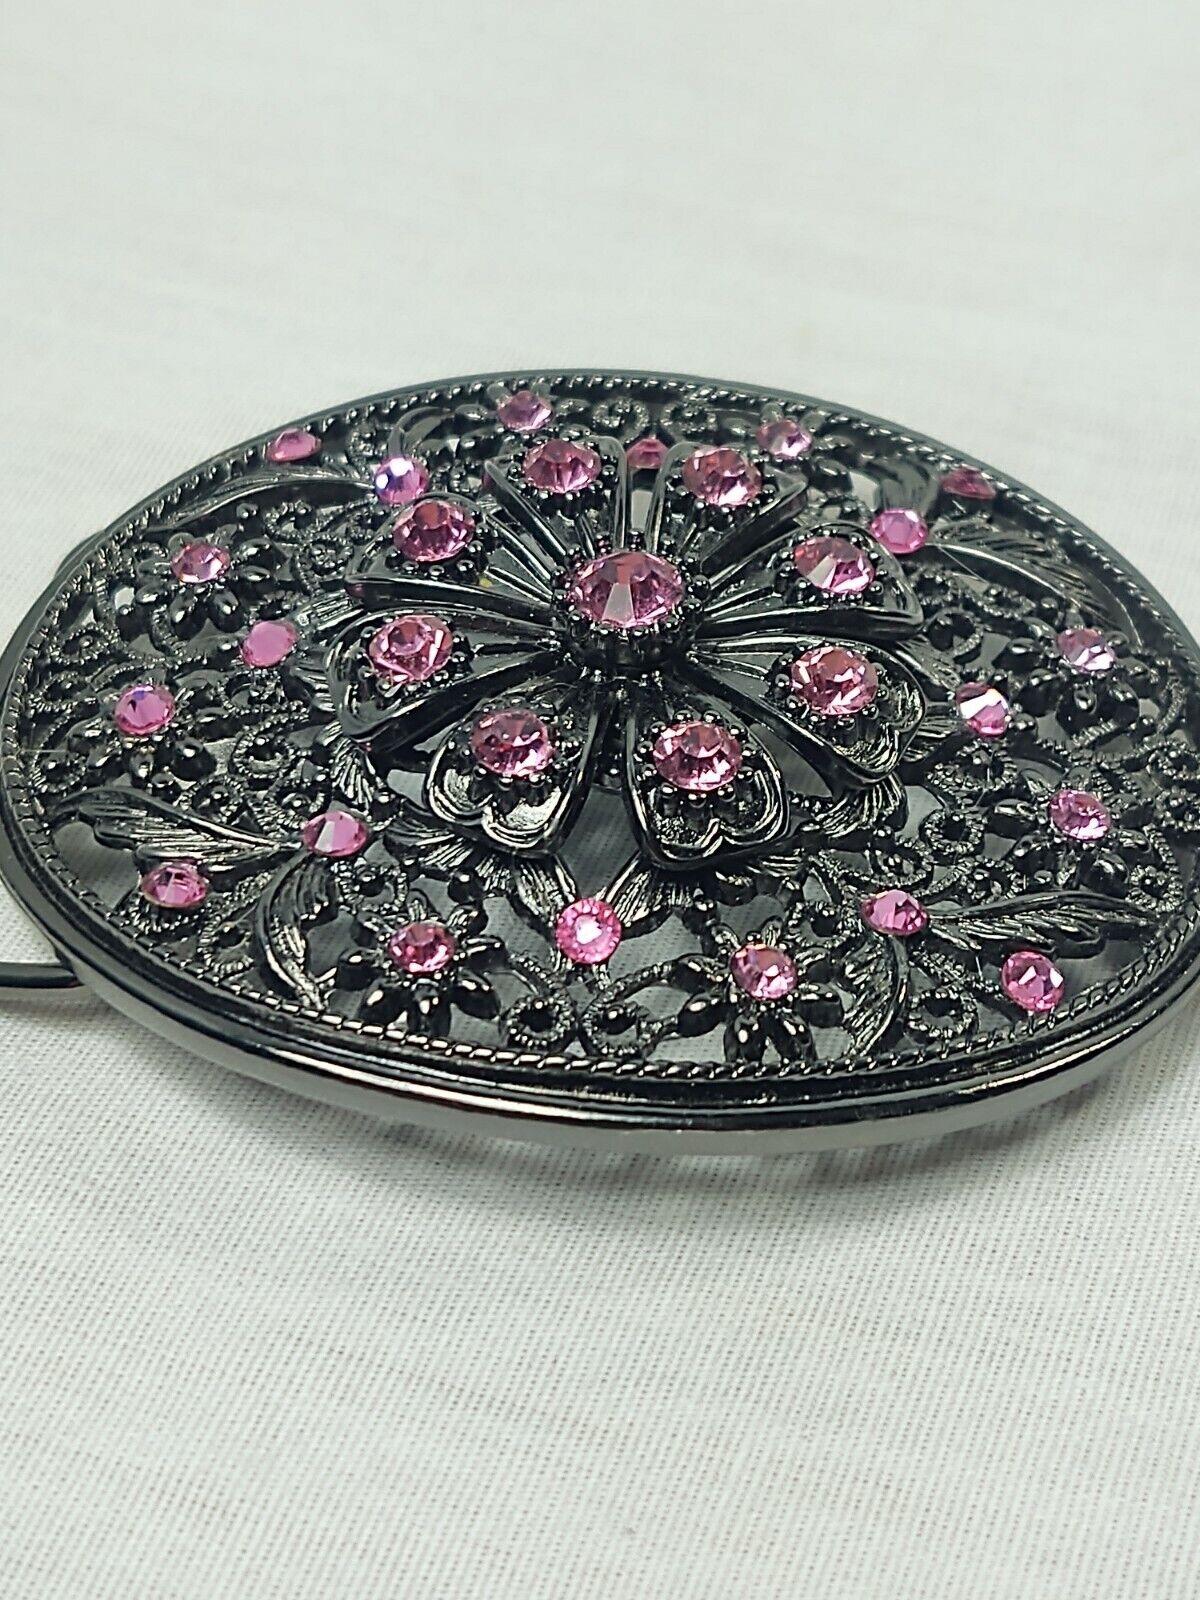 Women's Belt Buckle black with pink rhinestones see through